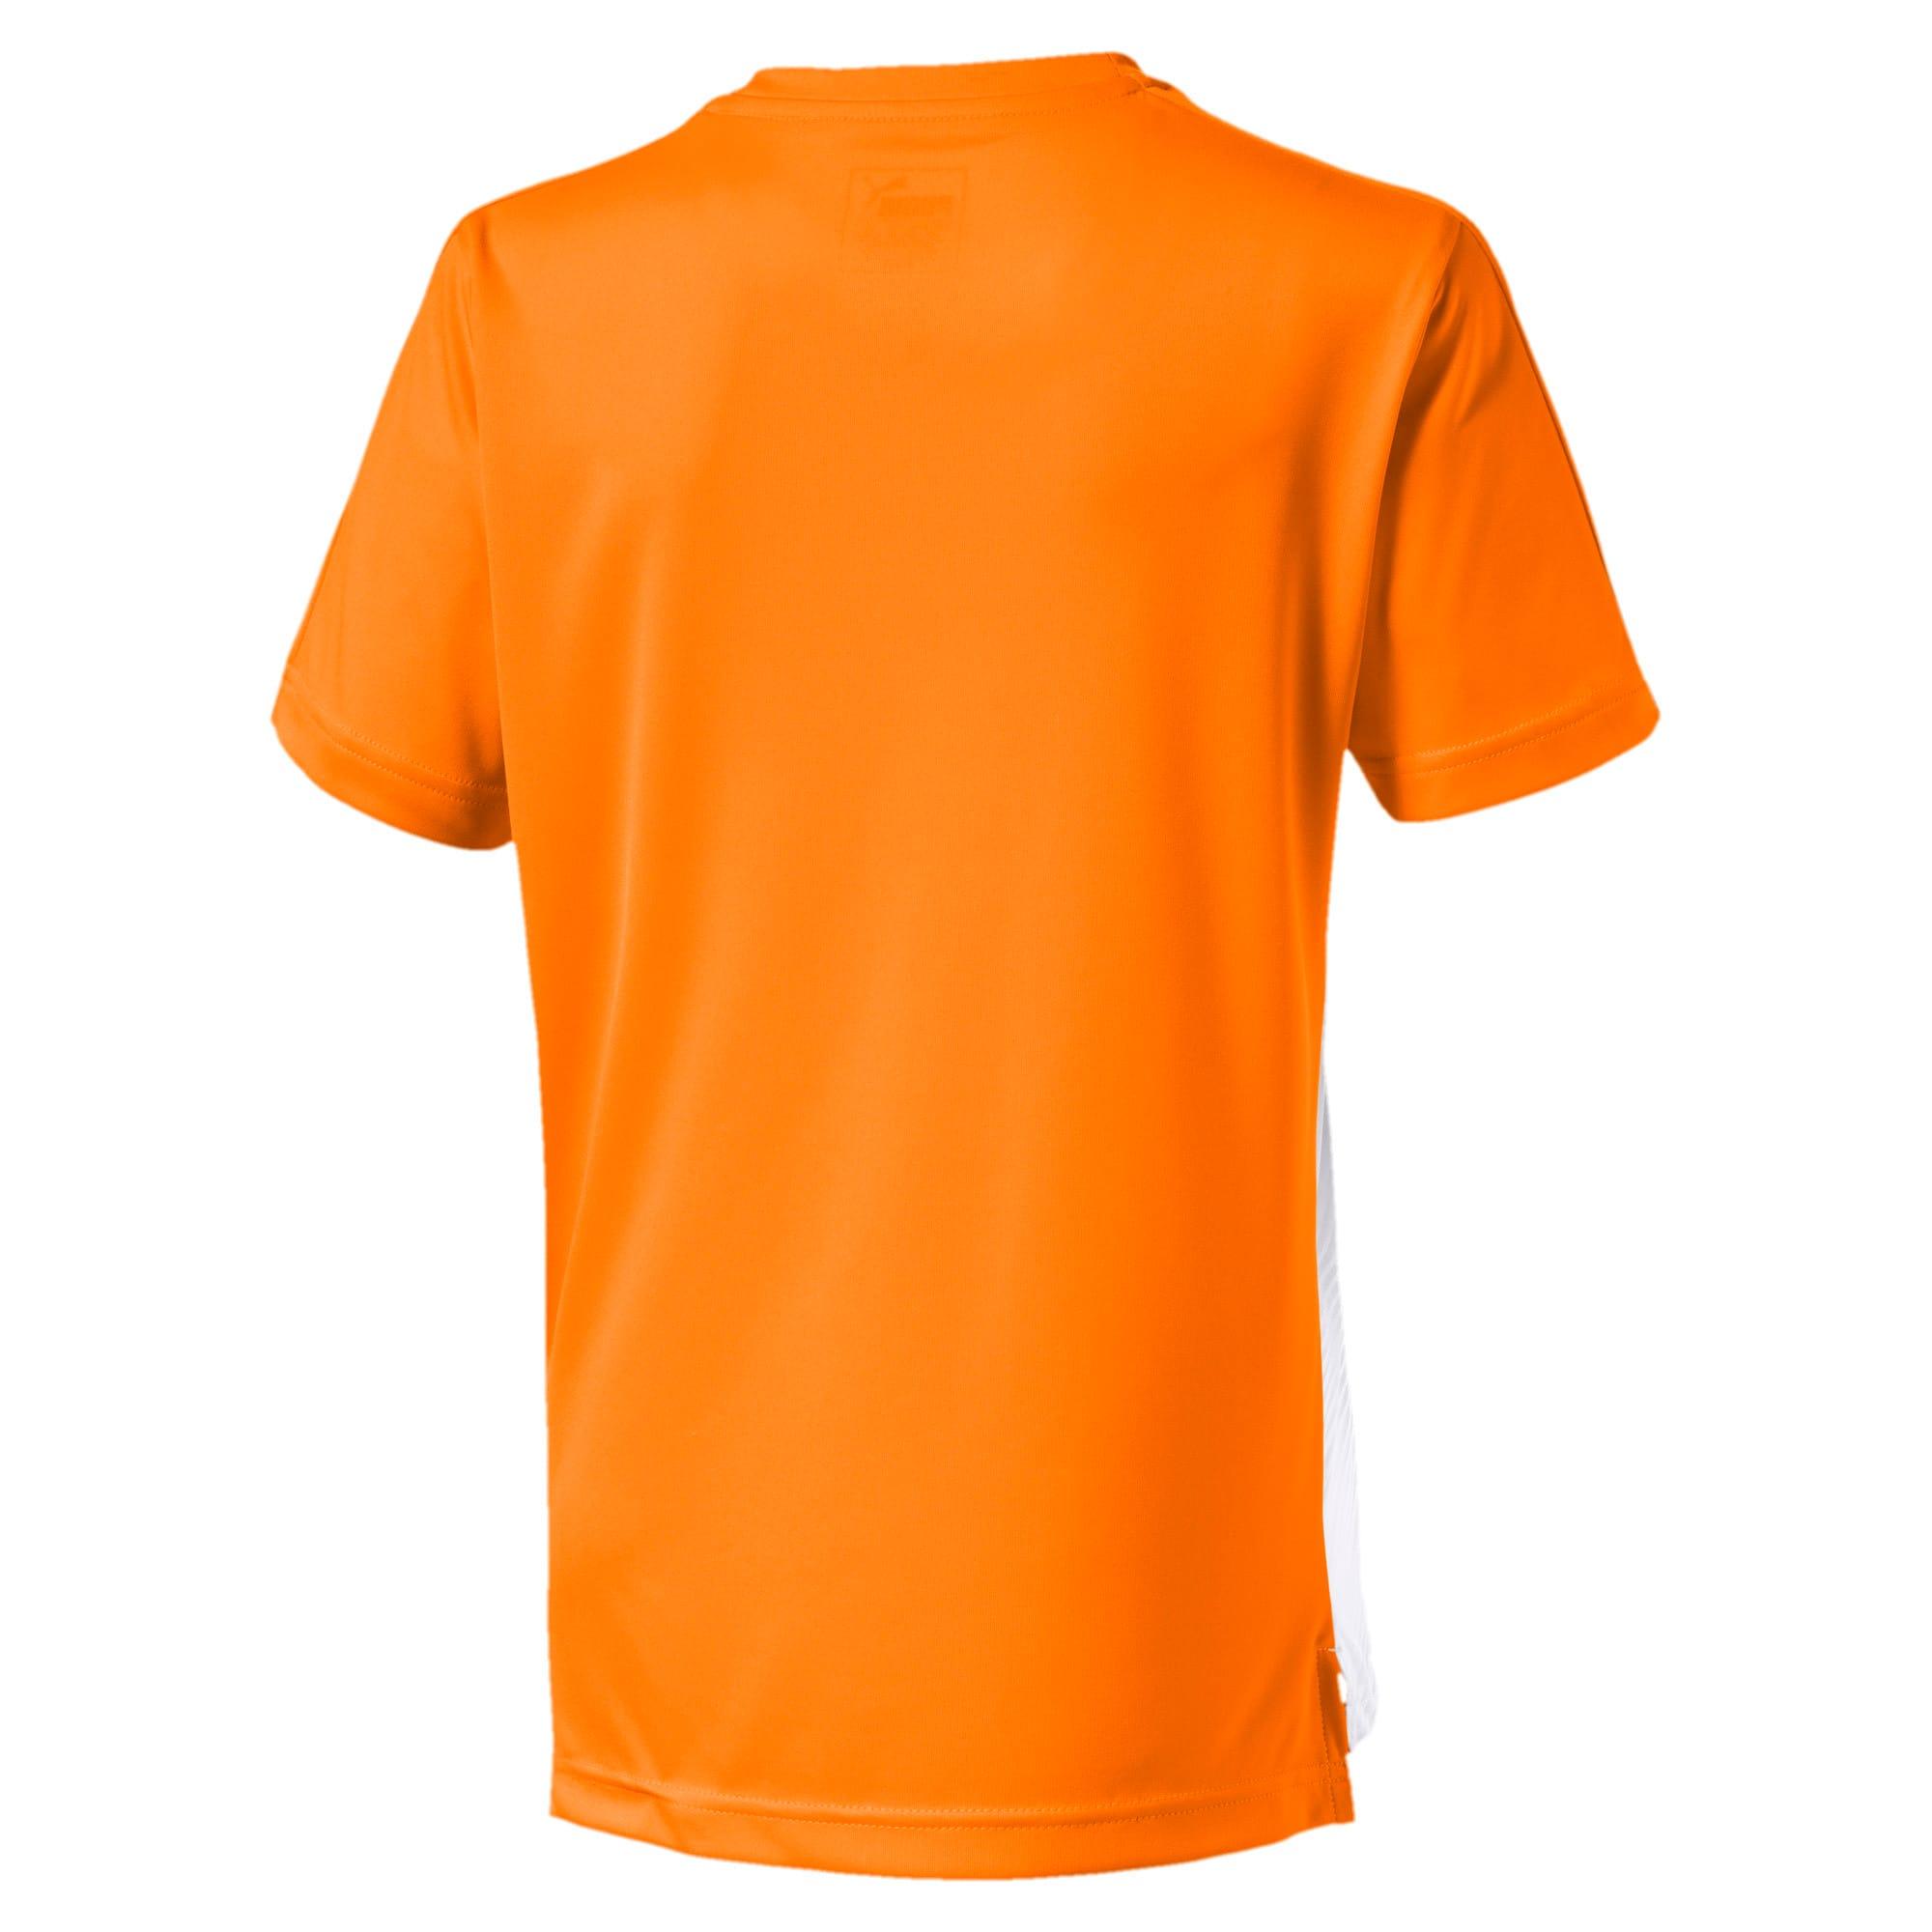 Imagen en miniatura 2 de Camiseta de niño Stadium Valencia CF, Vibrant Orange-Puma White, mediana